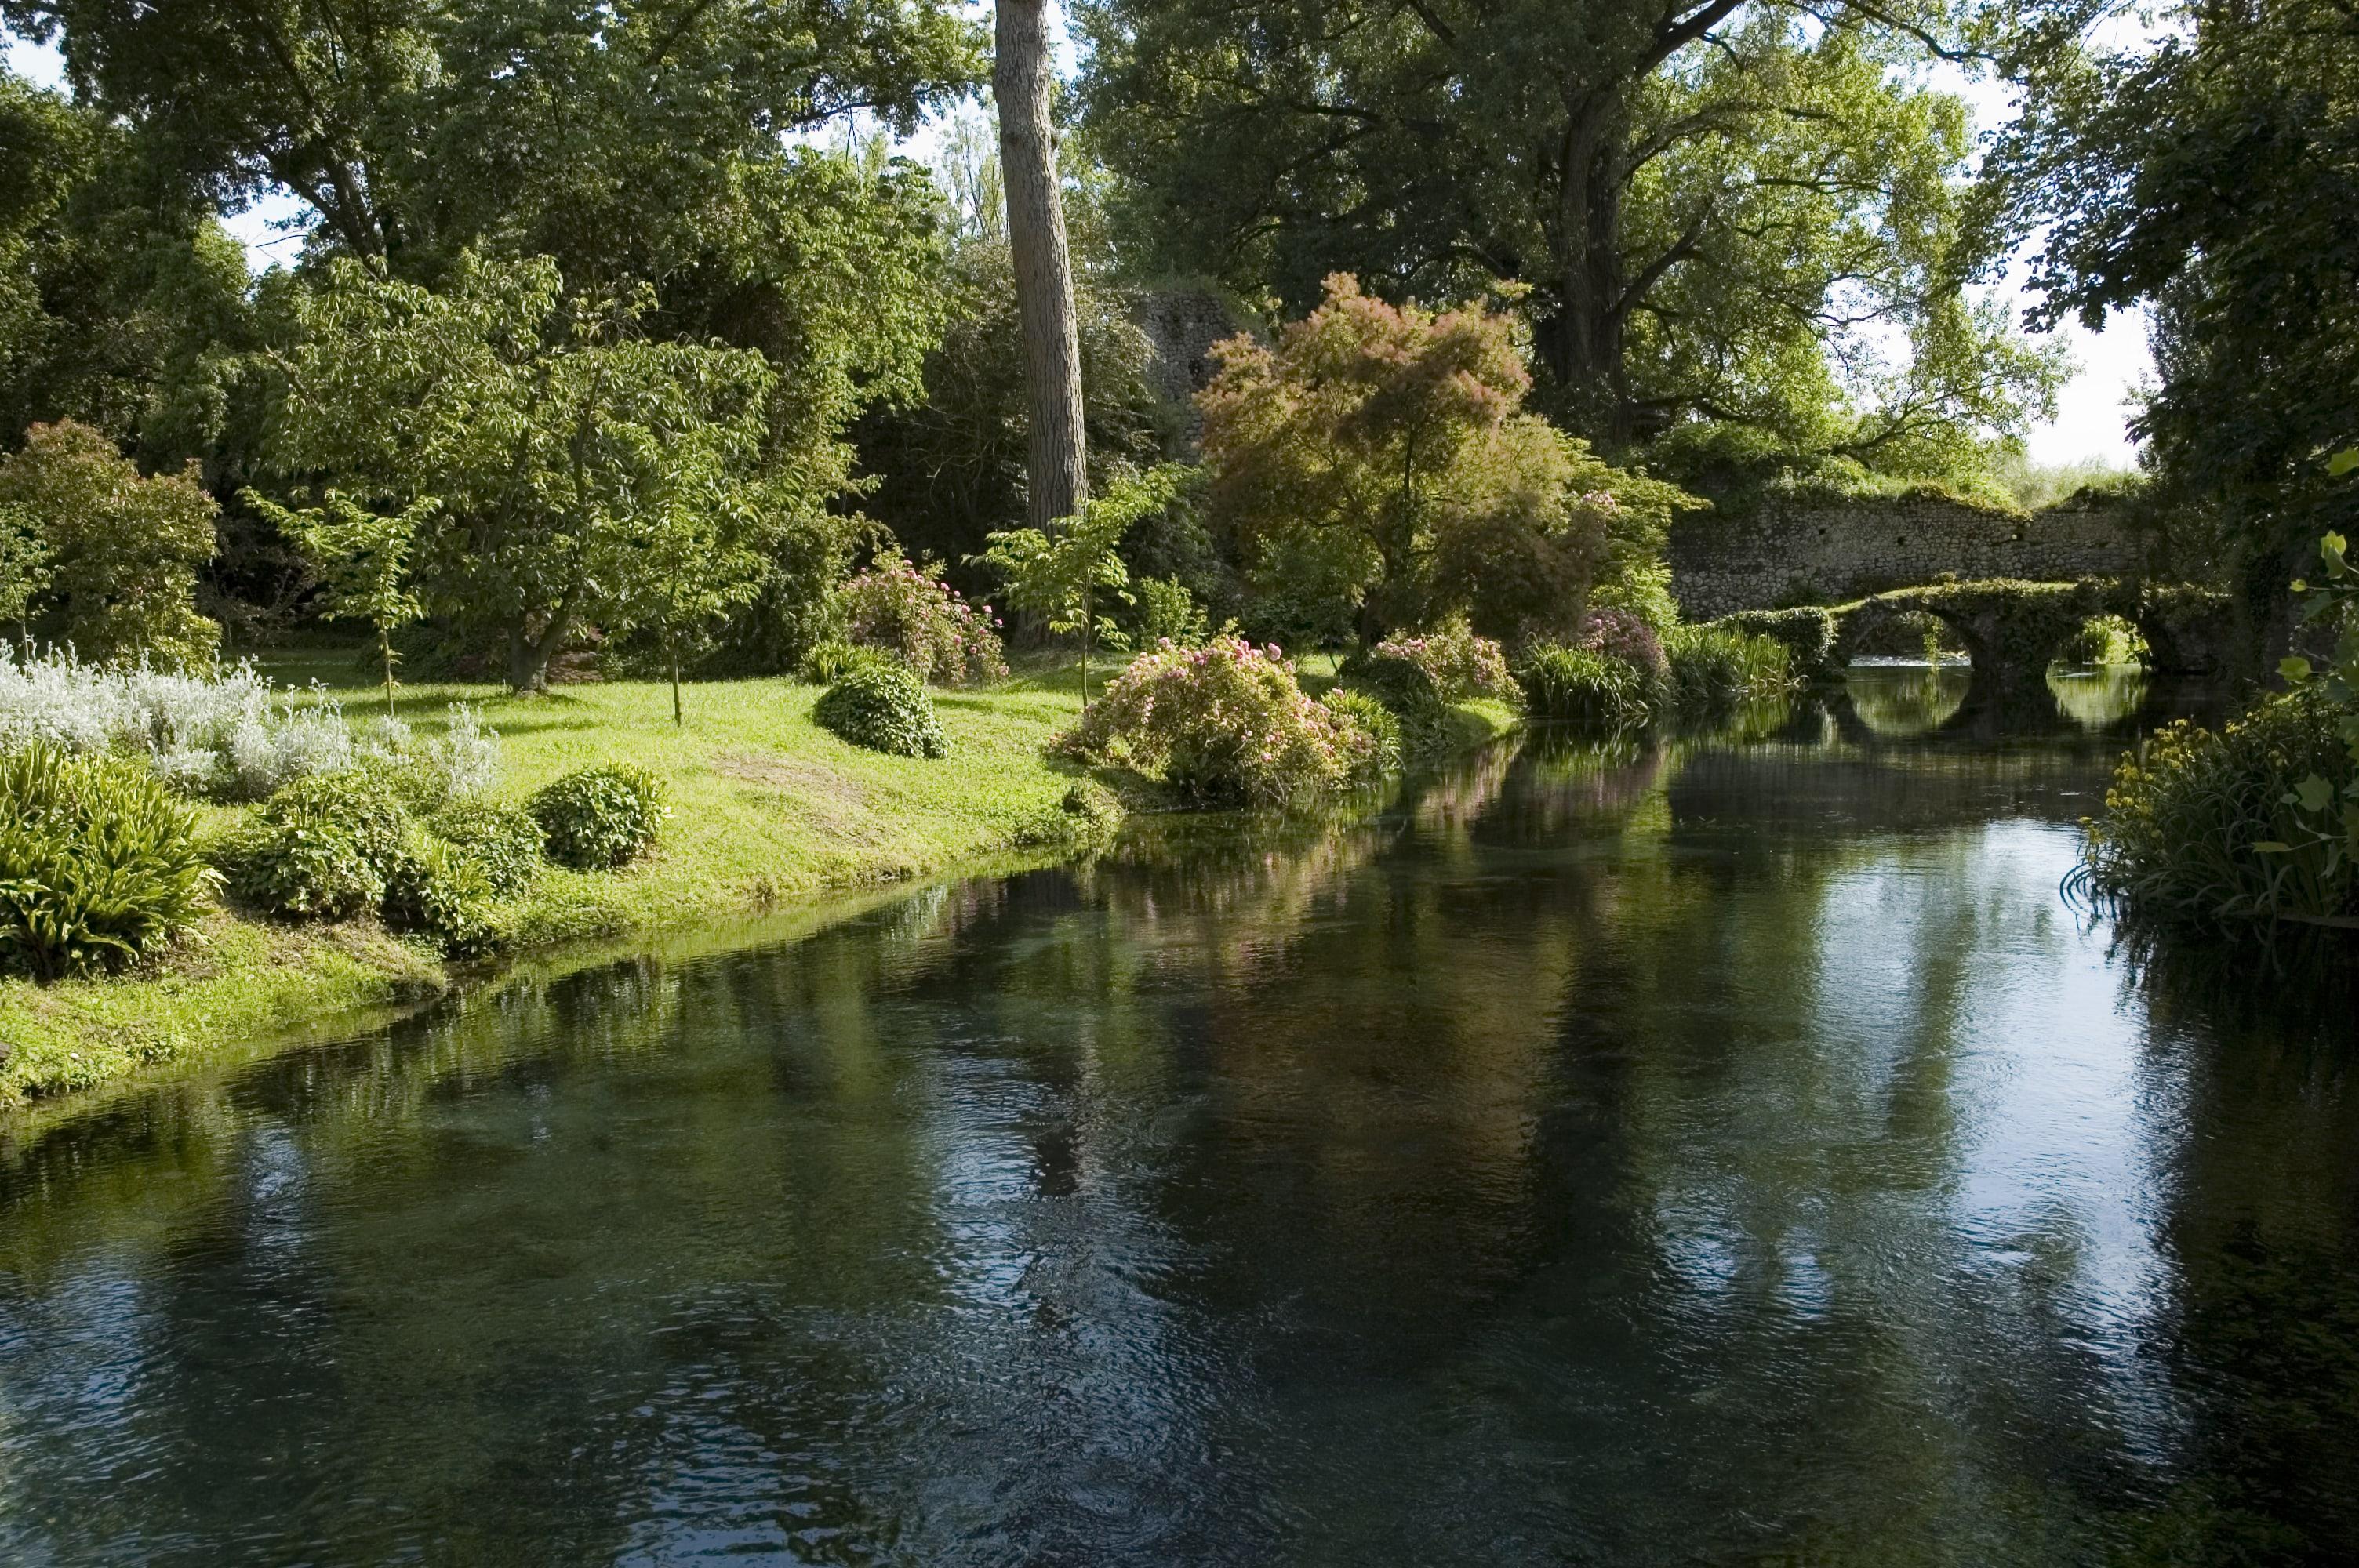 sermoneta-ninfa-giardino1